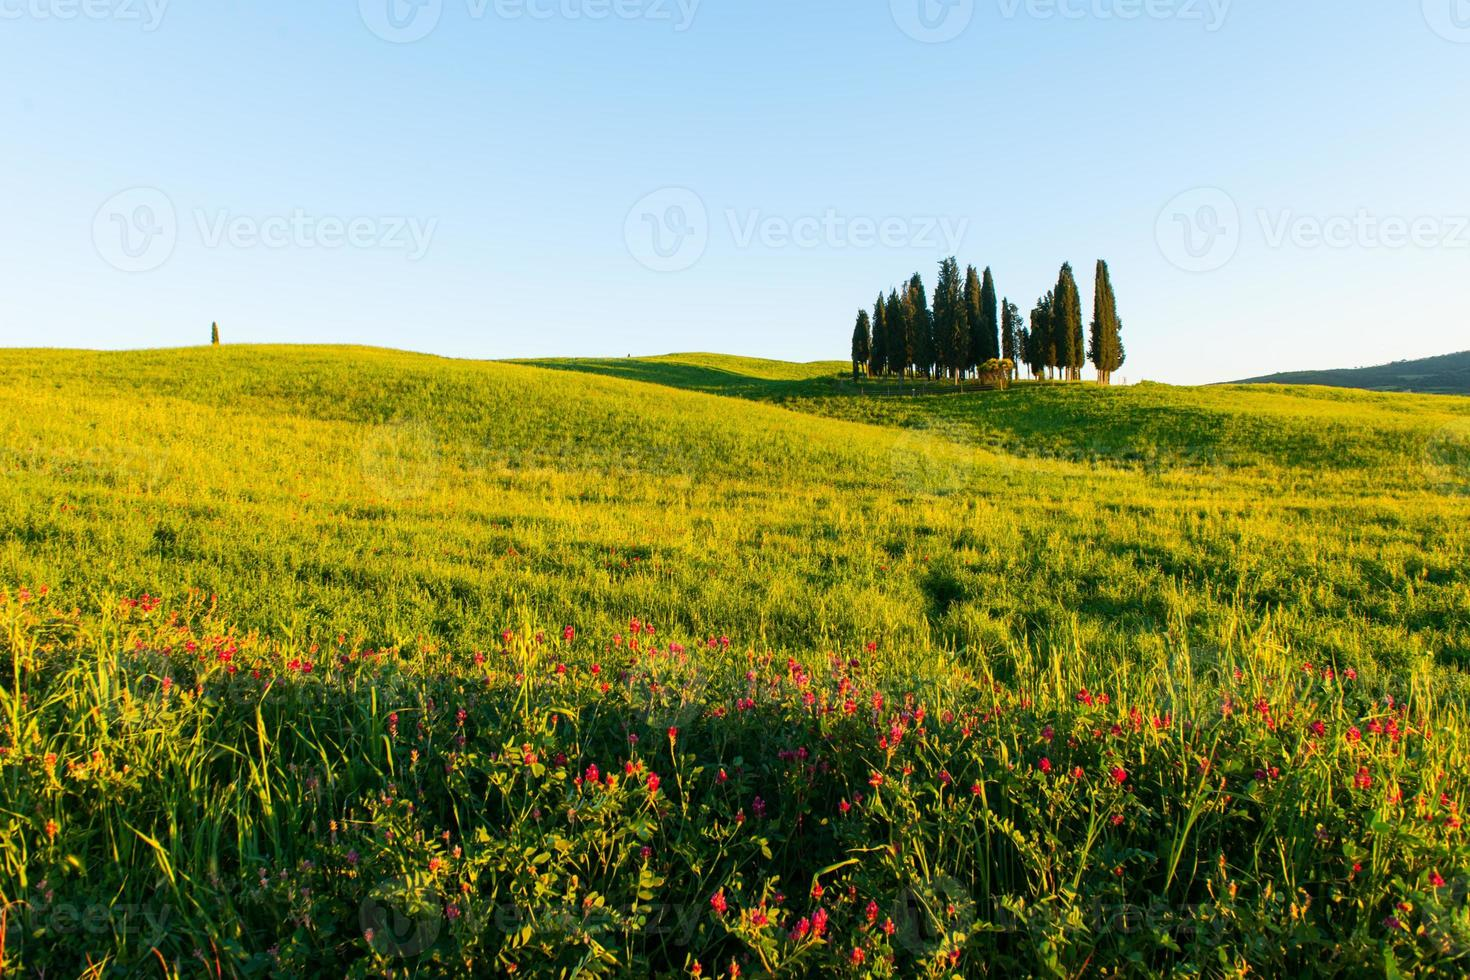 Toskana Landschaft in der Nähe von Pienza, Val d'orcia Italien foto